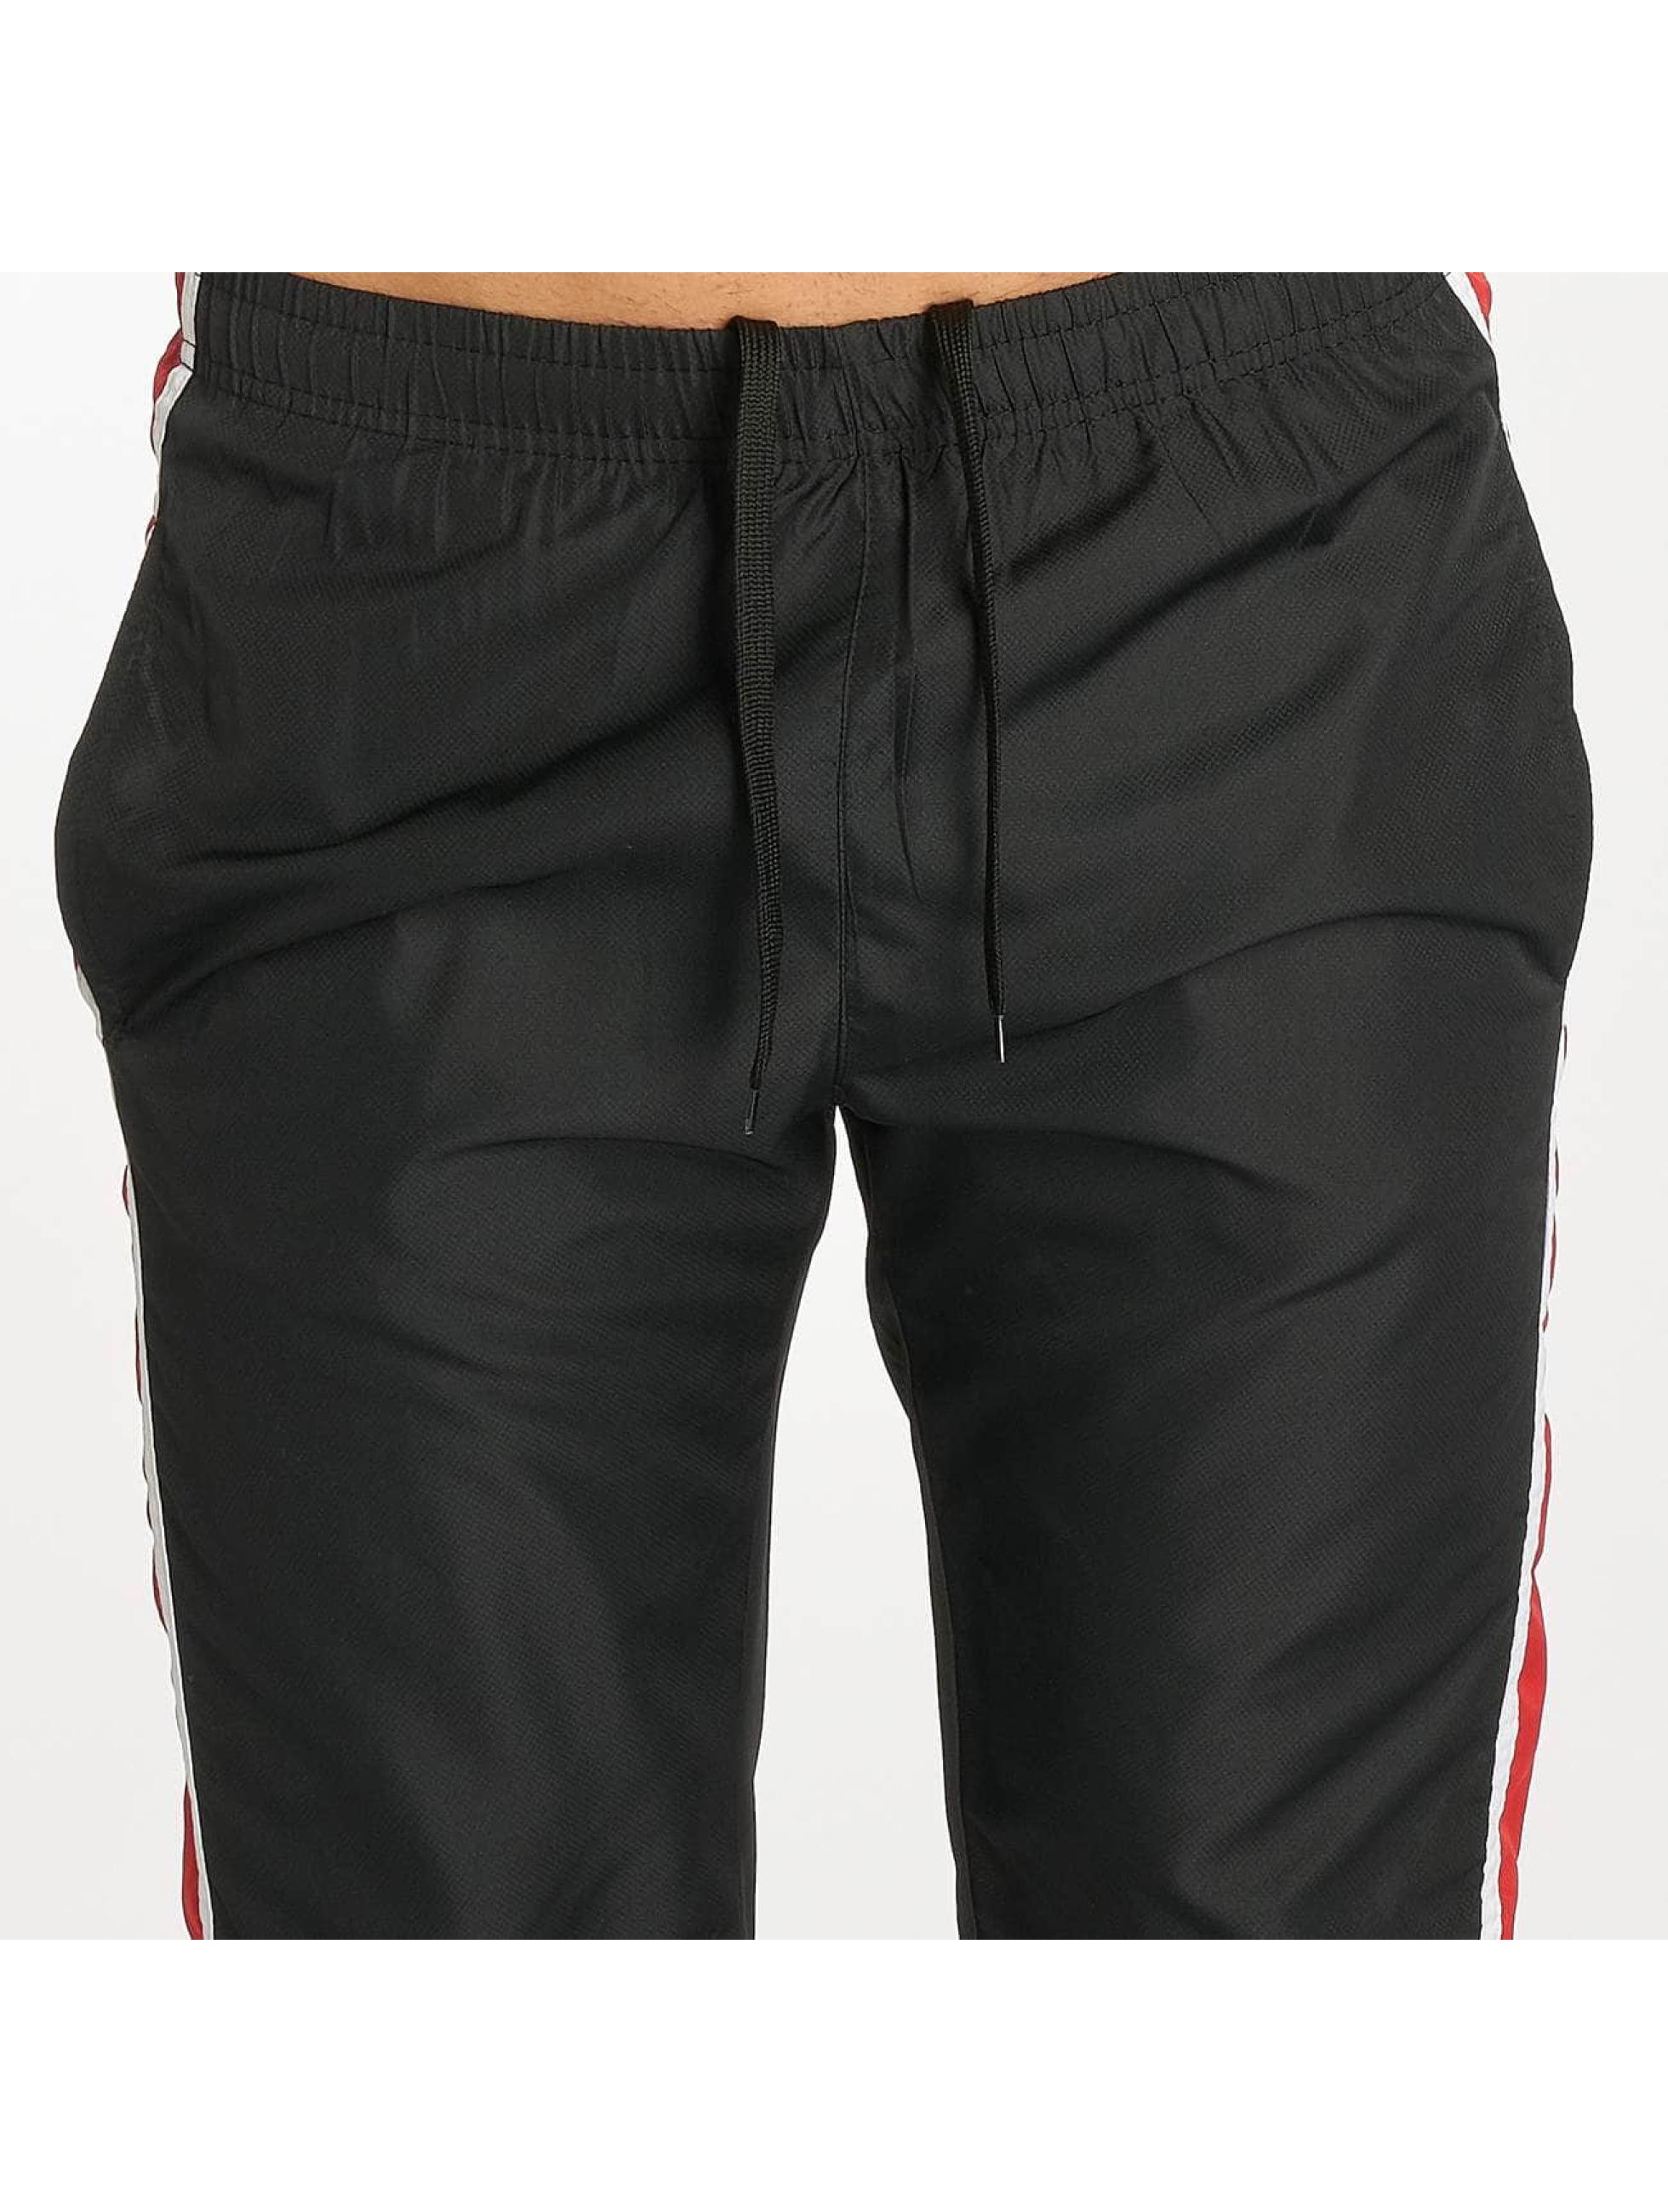 Zayne Paris Shorts Stripe nero